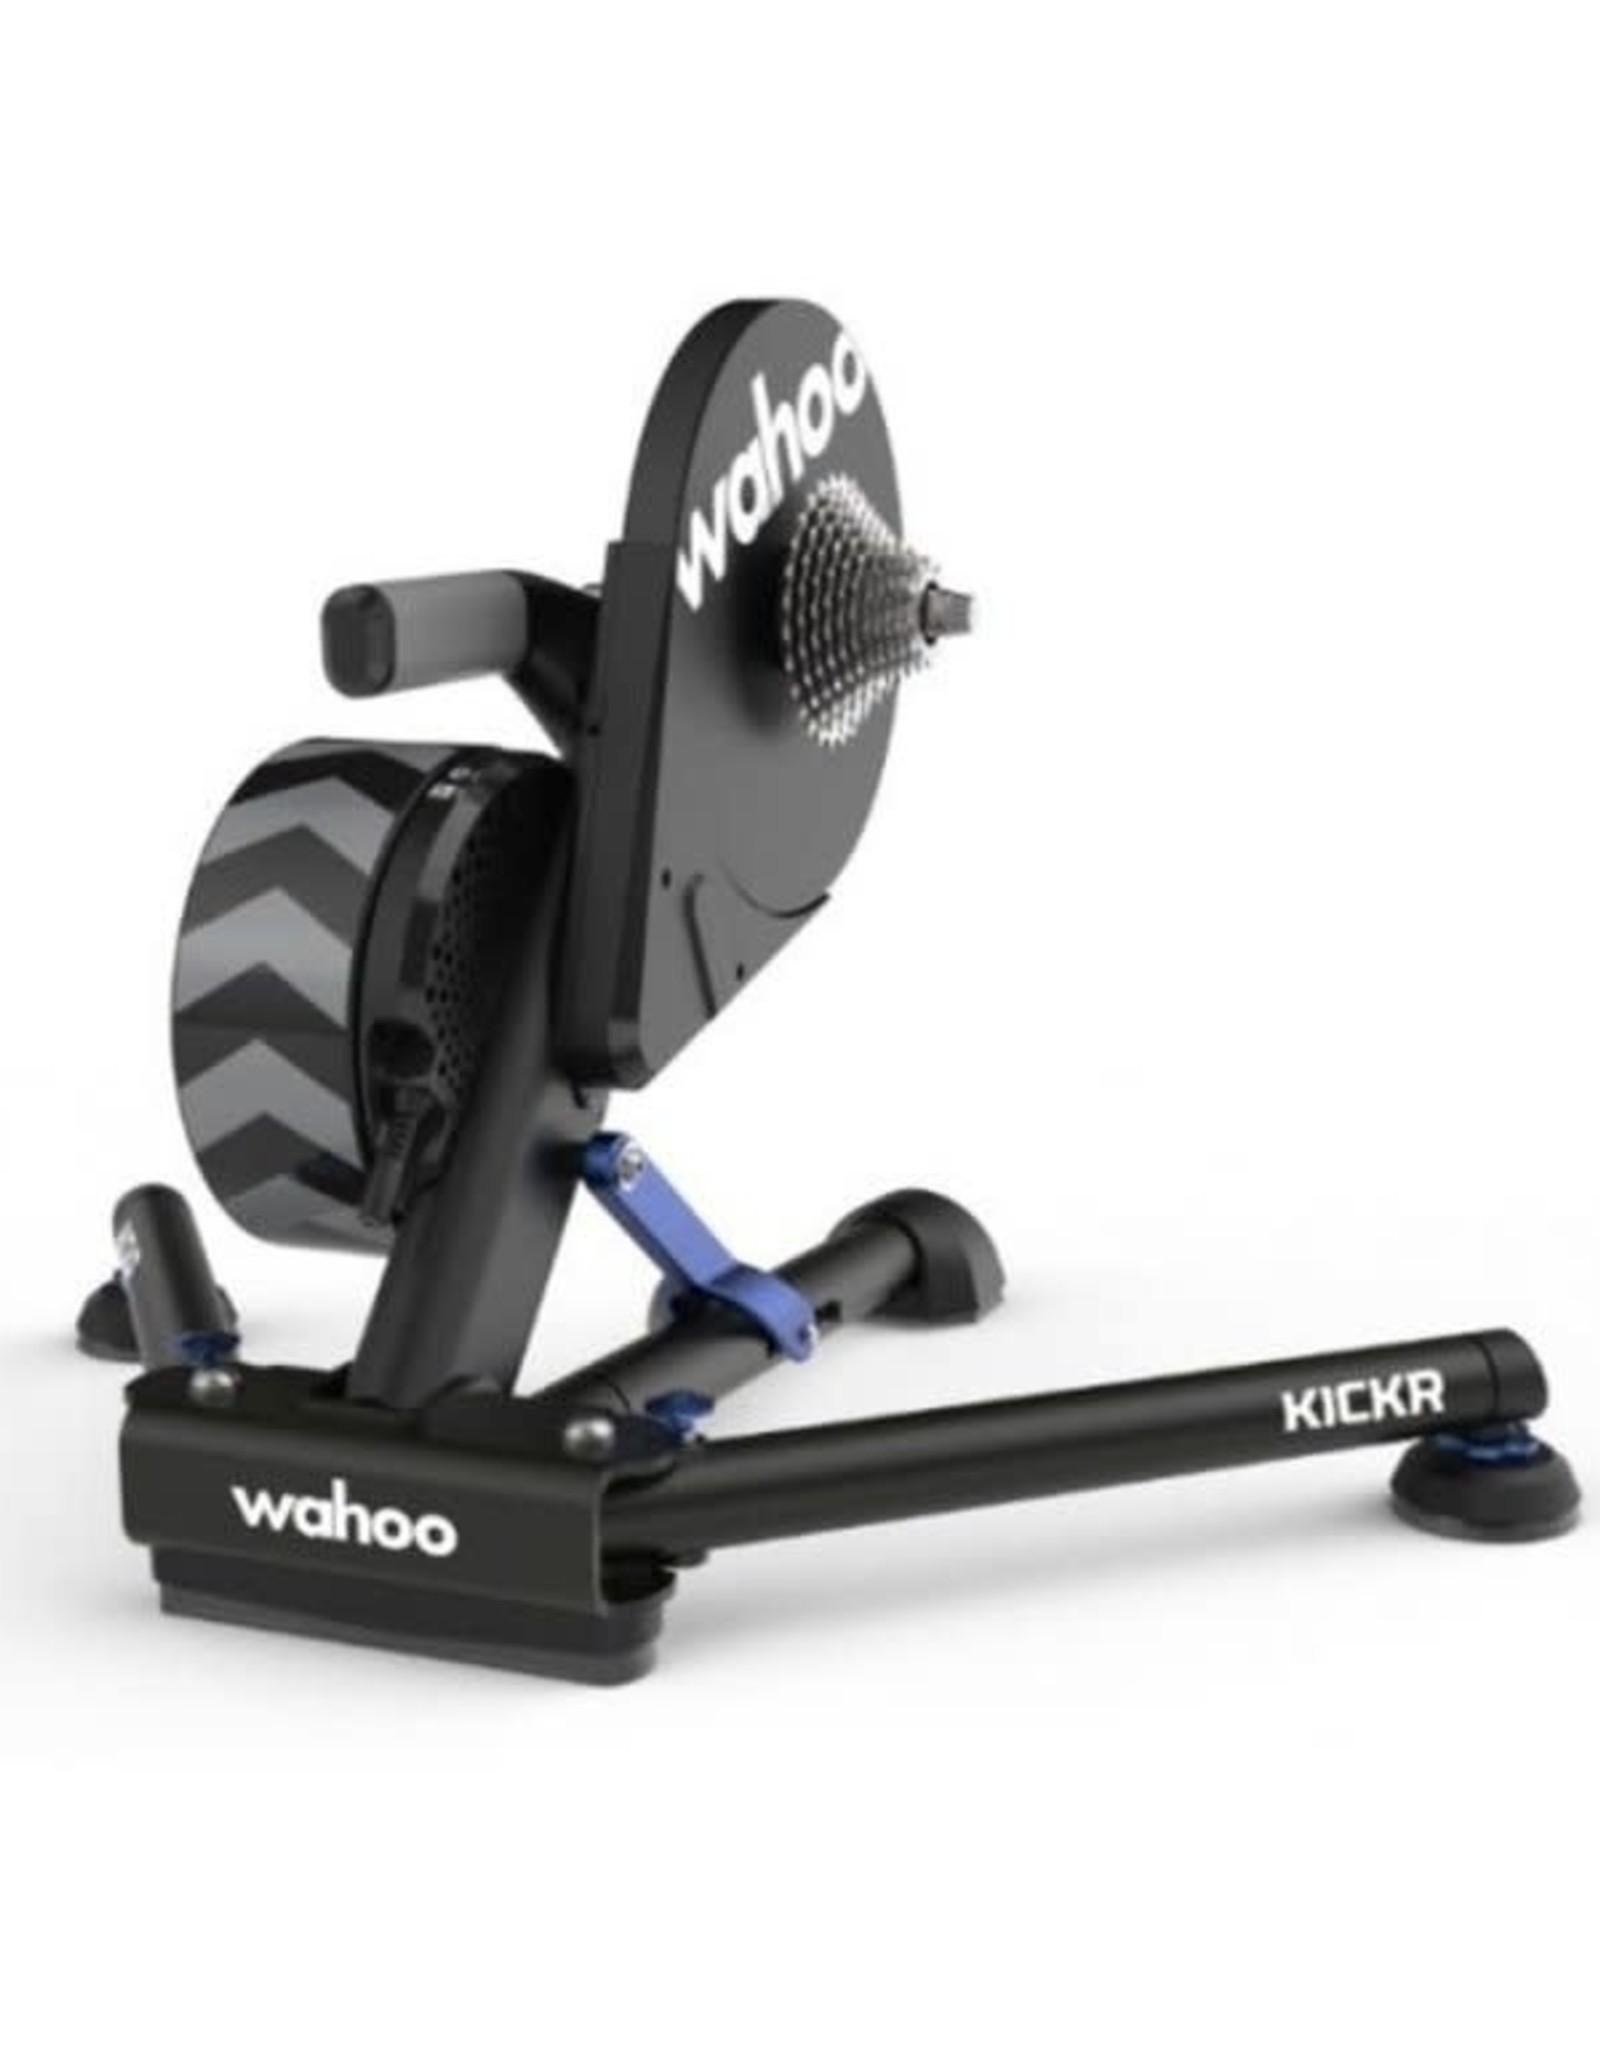 WAHOO KICKR V5 SMART POWER TRAINER